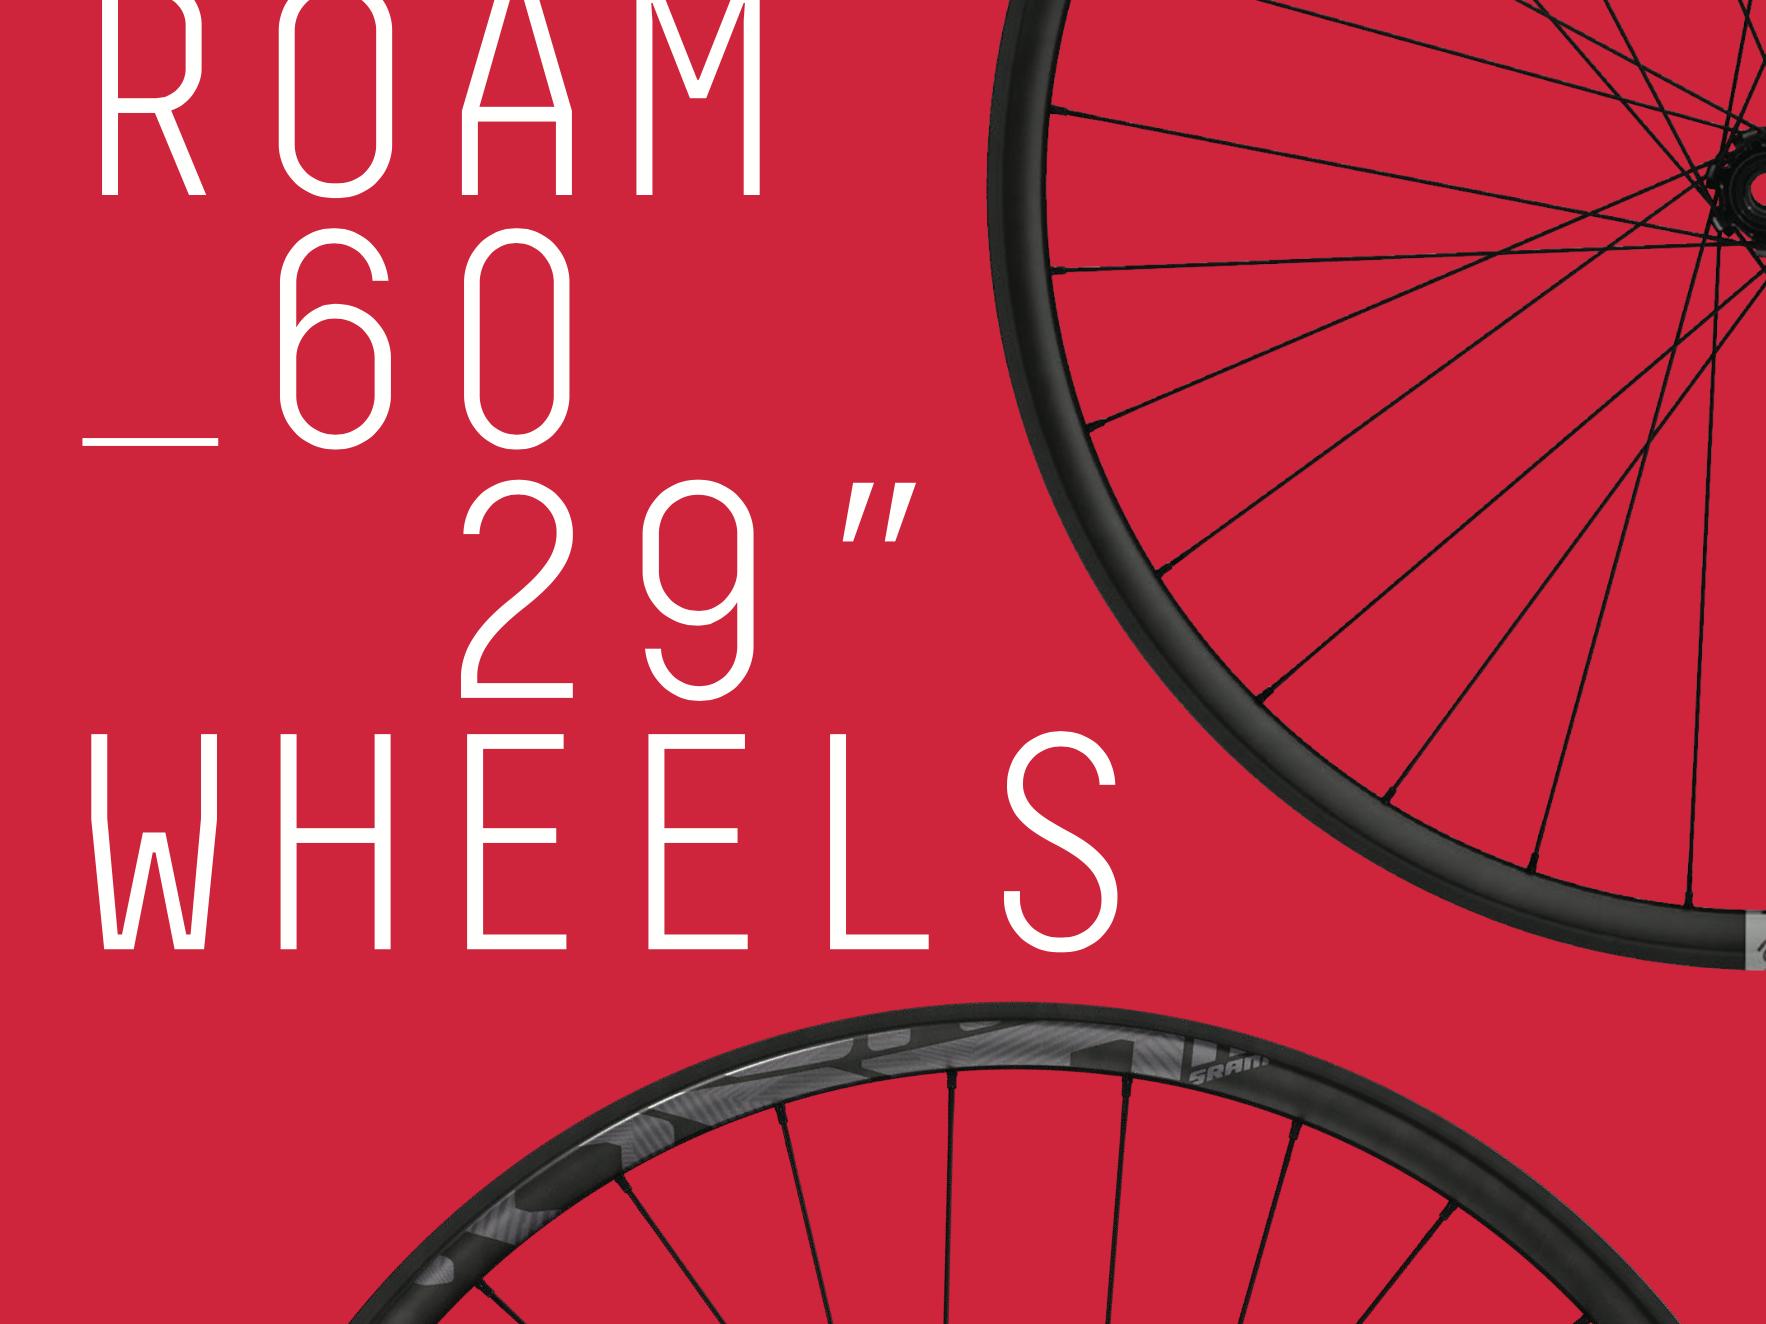 "Noah Bodman reviews Sram's ROAM 60 29"" wheels for Blister Gear Review"